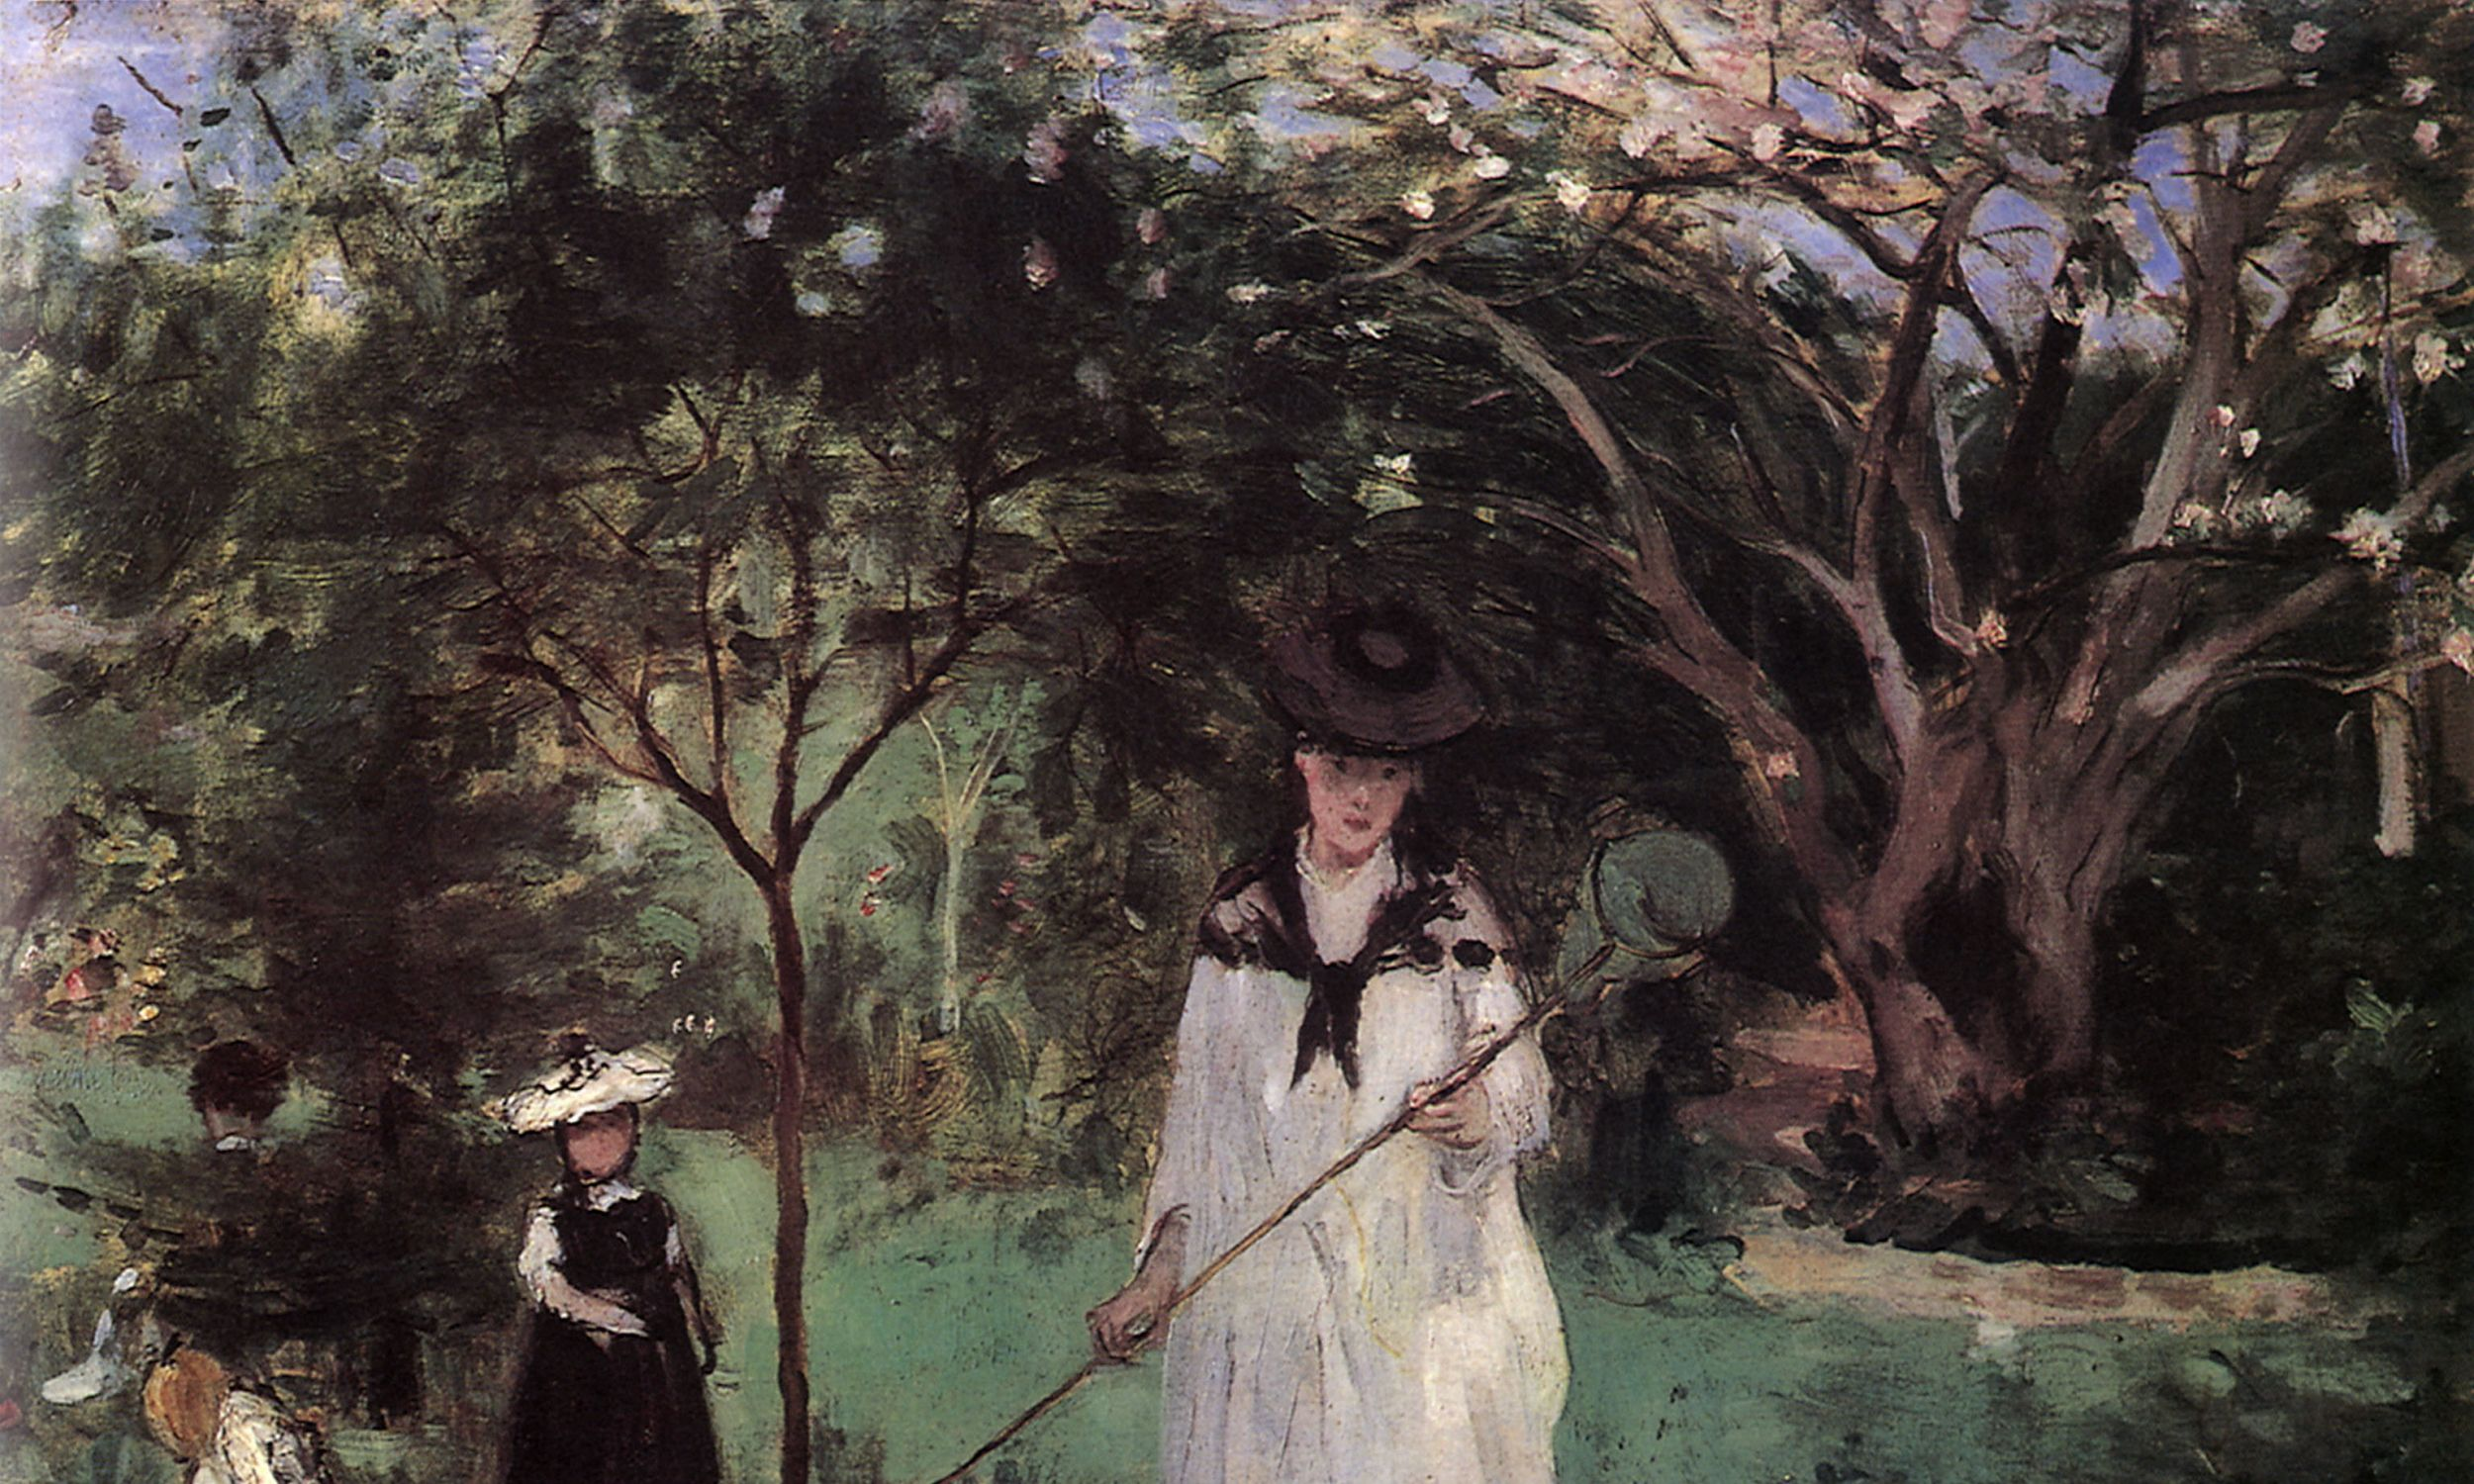 """Polowanie na motyle, Edma Pontillon ze swymi córkami Jeanne i Blanche"" (1874 r.). Fot. Picturenow/Universal Images Group via Getty Images"